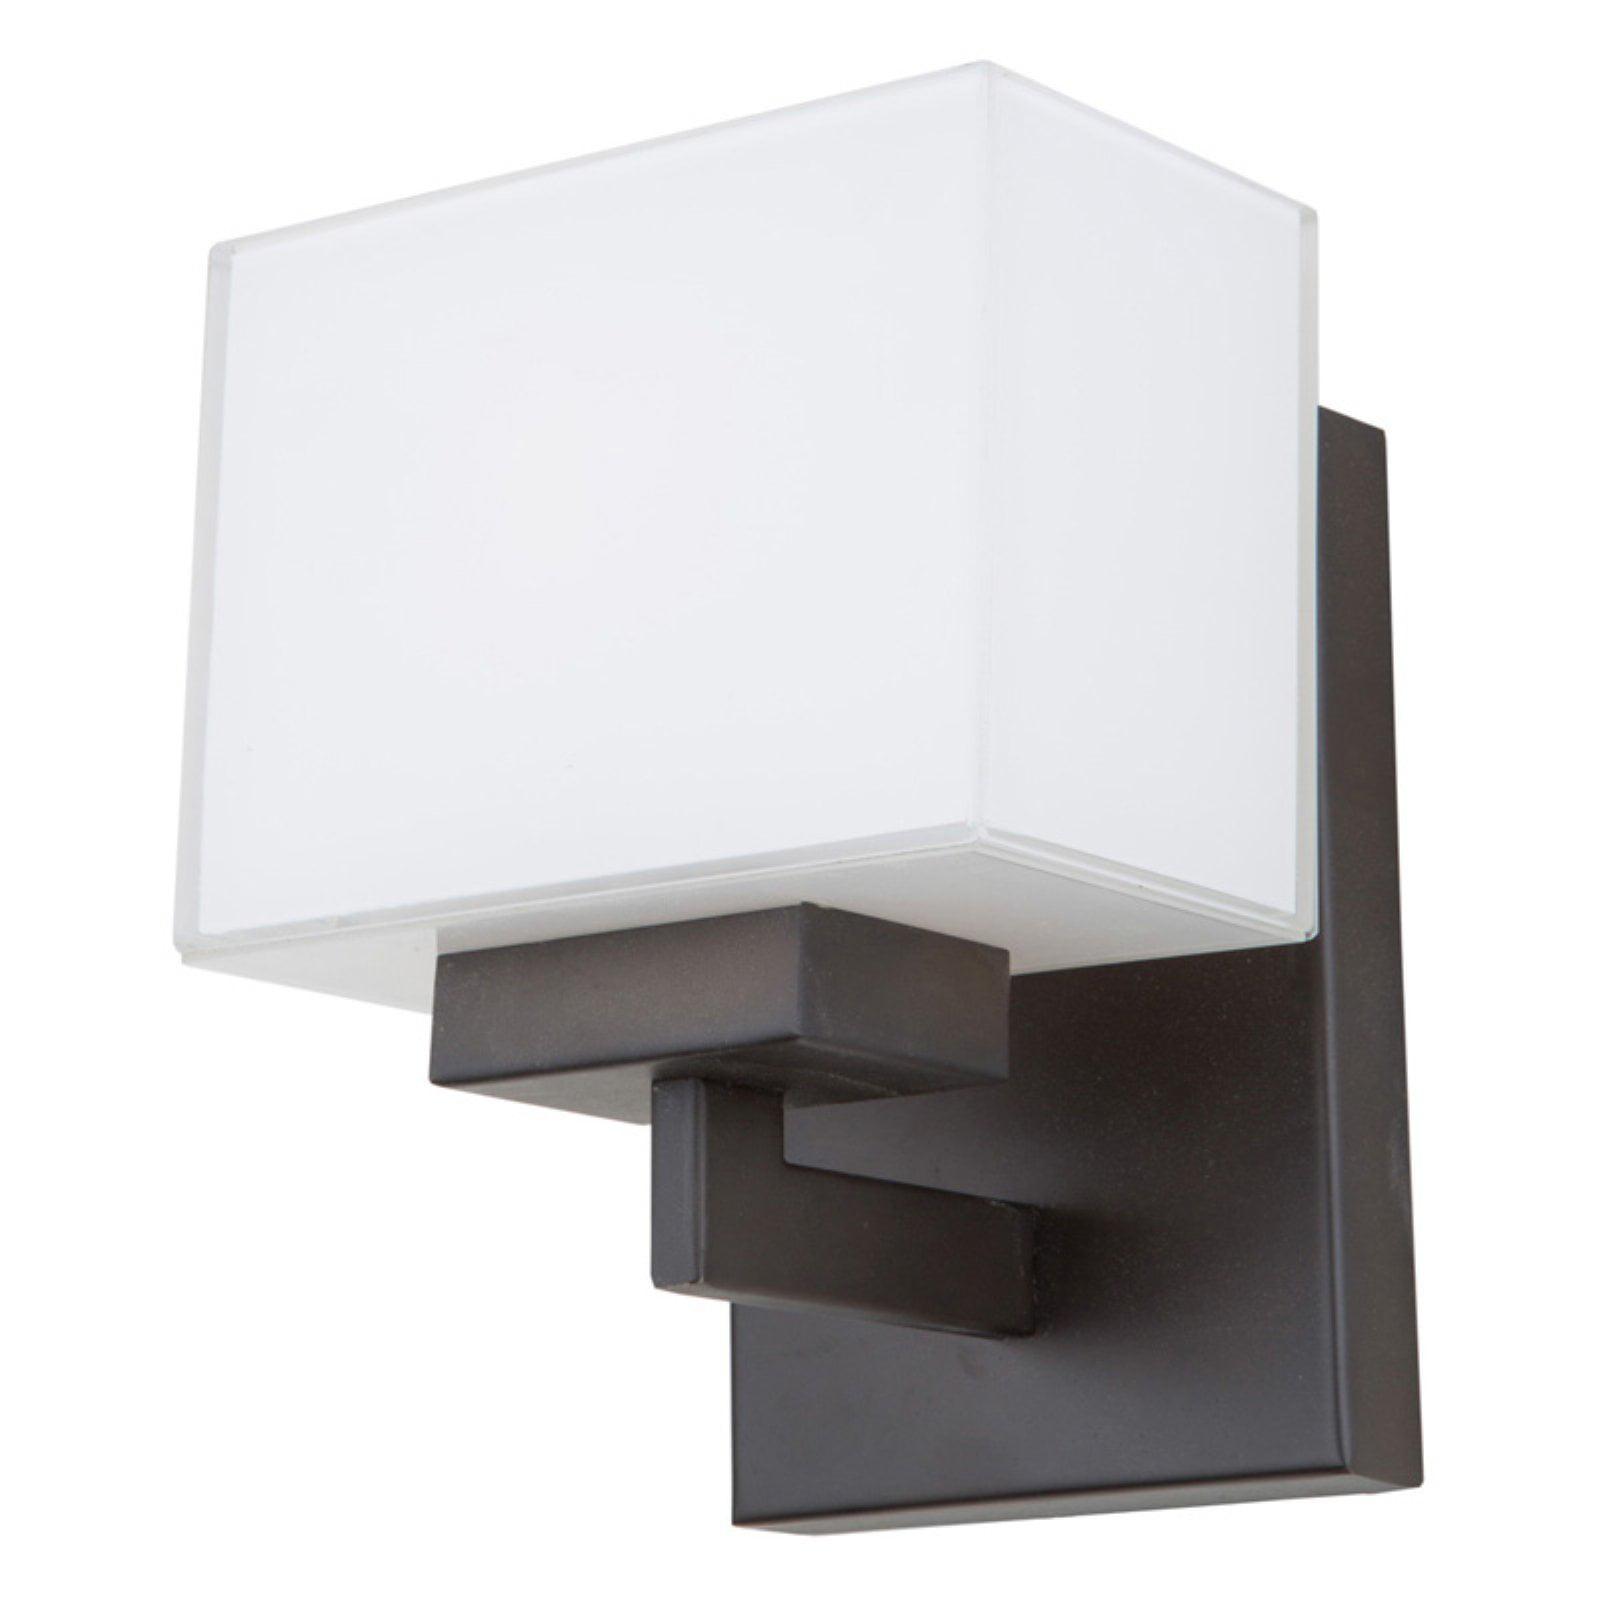 quality design 563f0 4beff Artcraft Cube Lights SC13187OB Wall Sconce